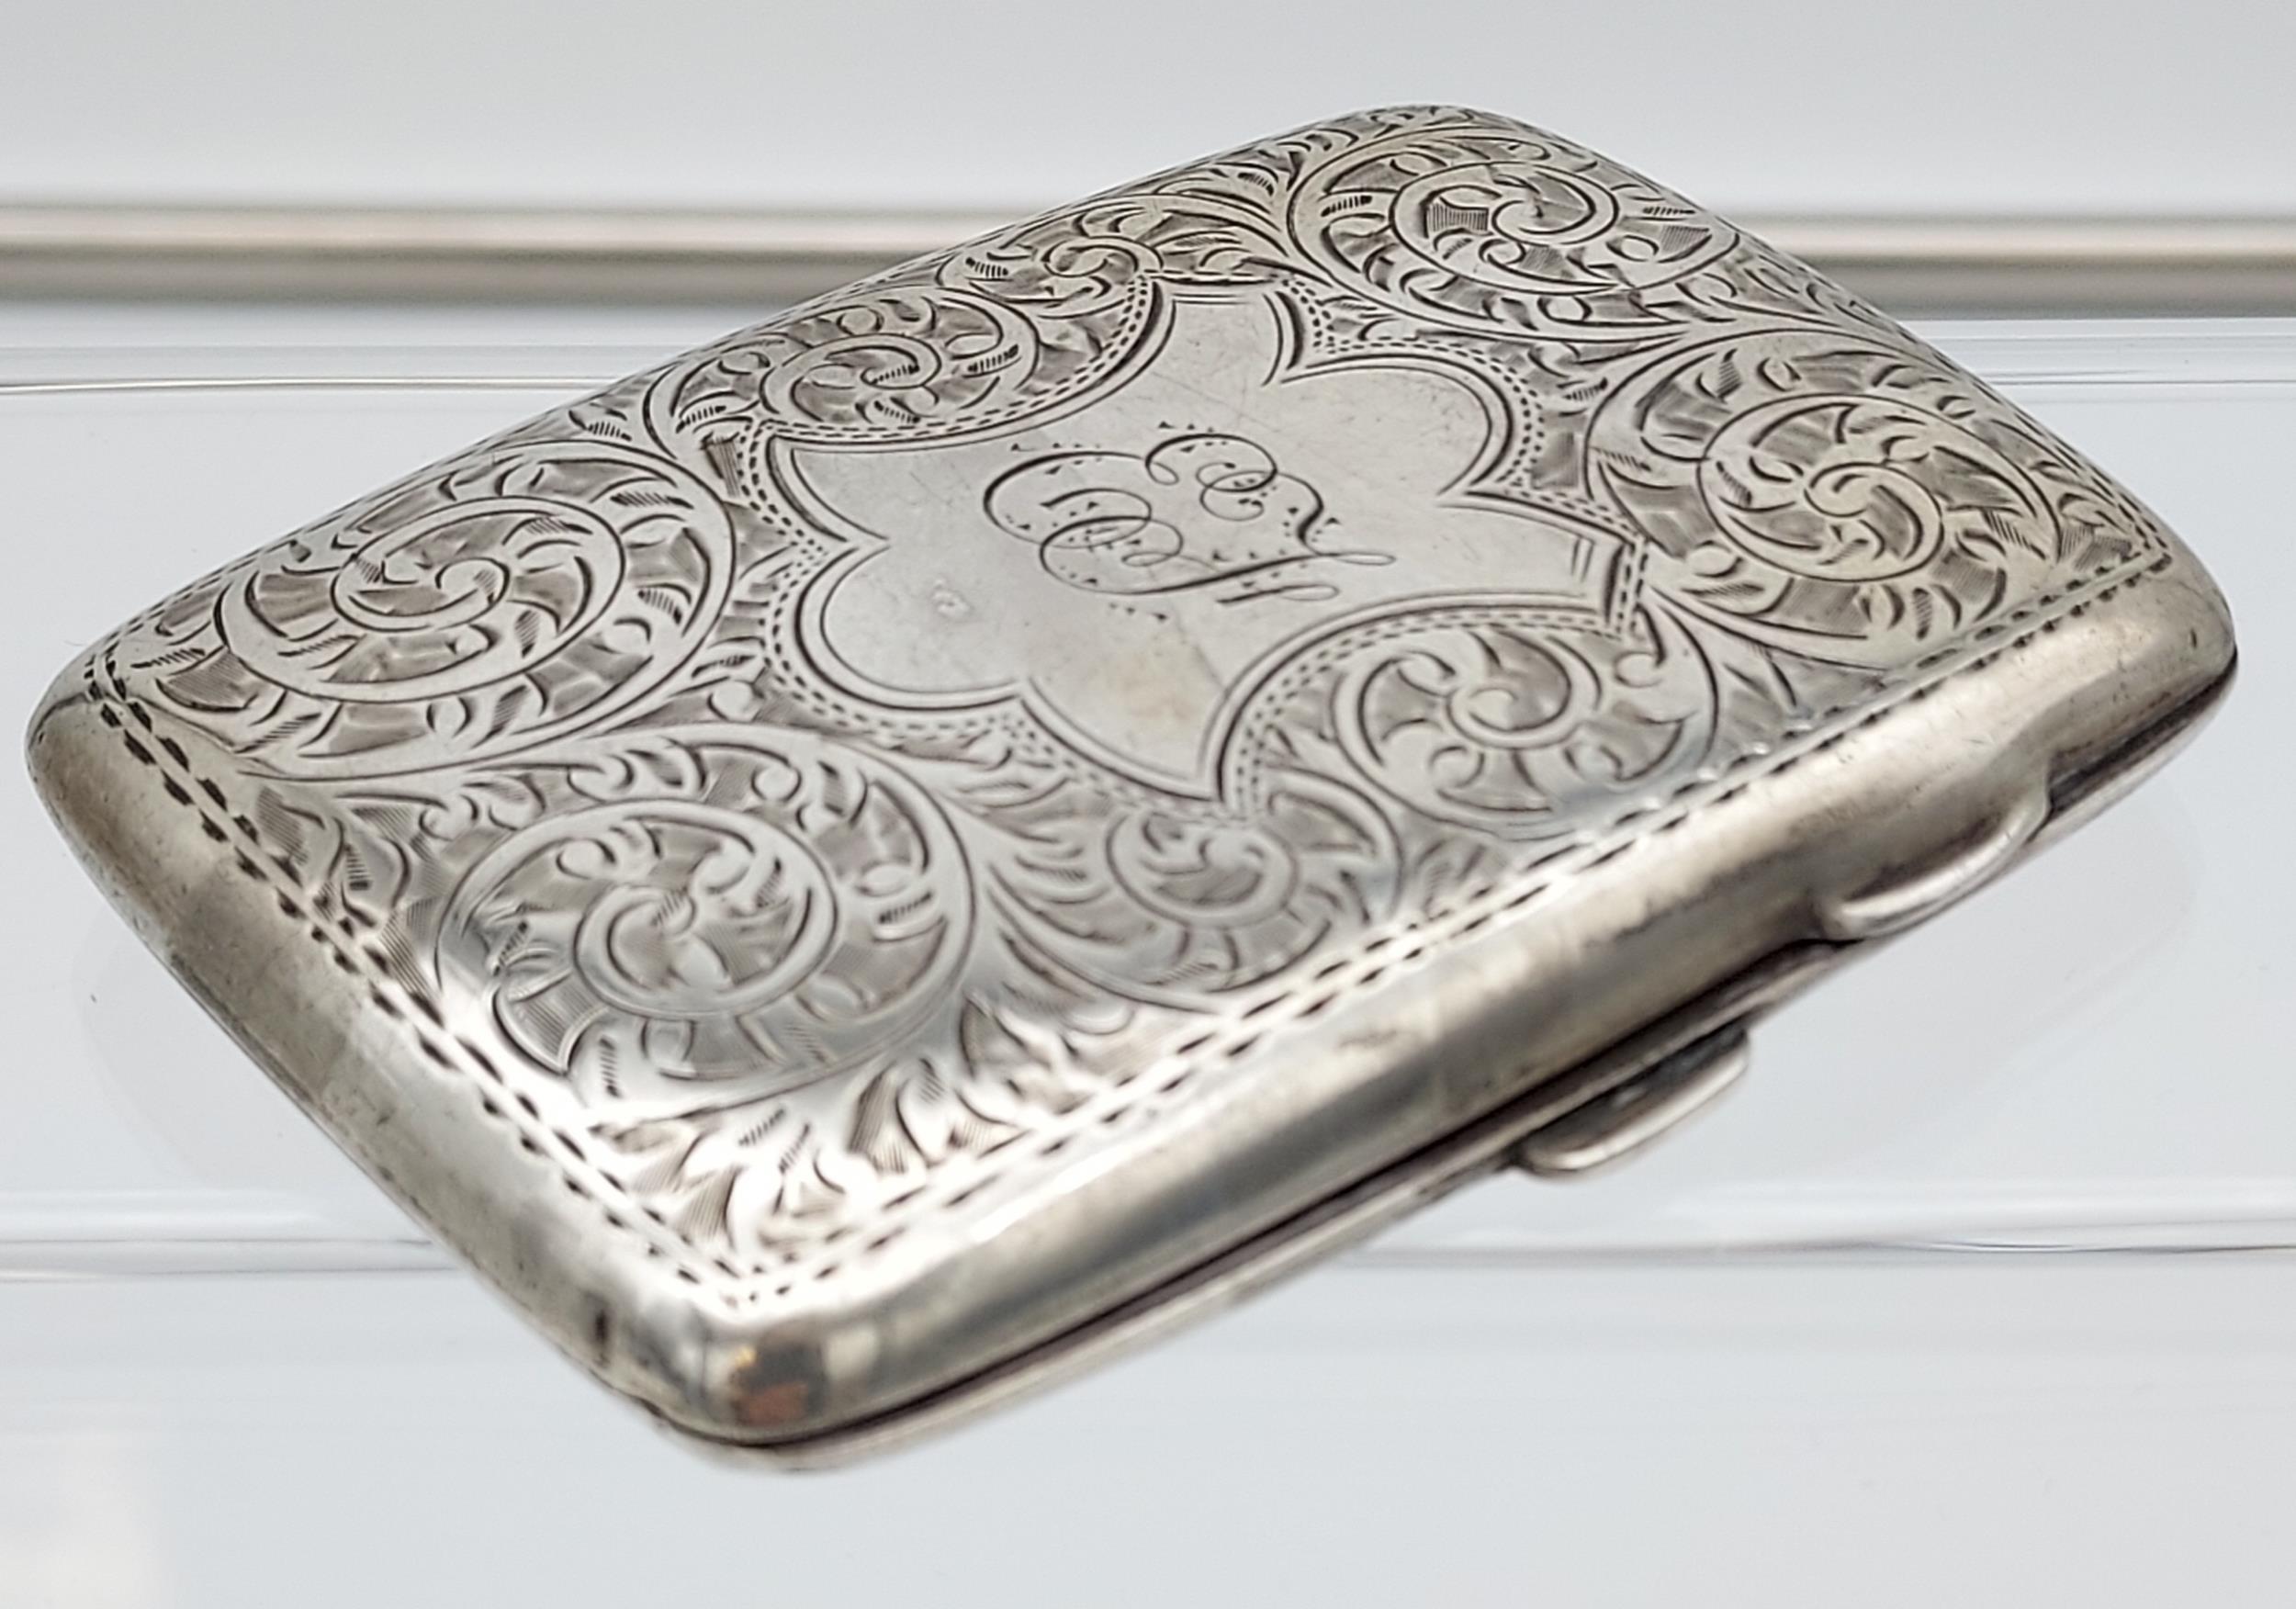 A Birmingham silver cigarette box together with a Birmingham silver cigarette case. - Image 7 of 9